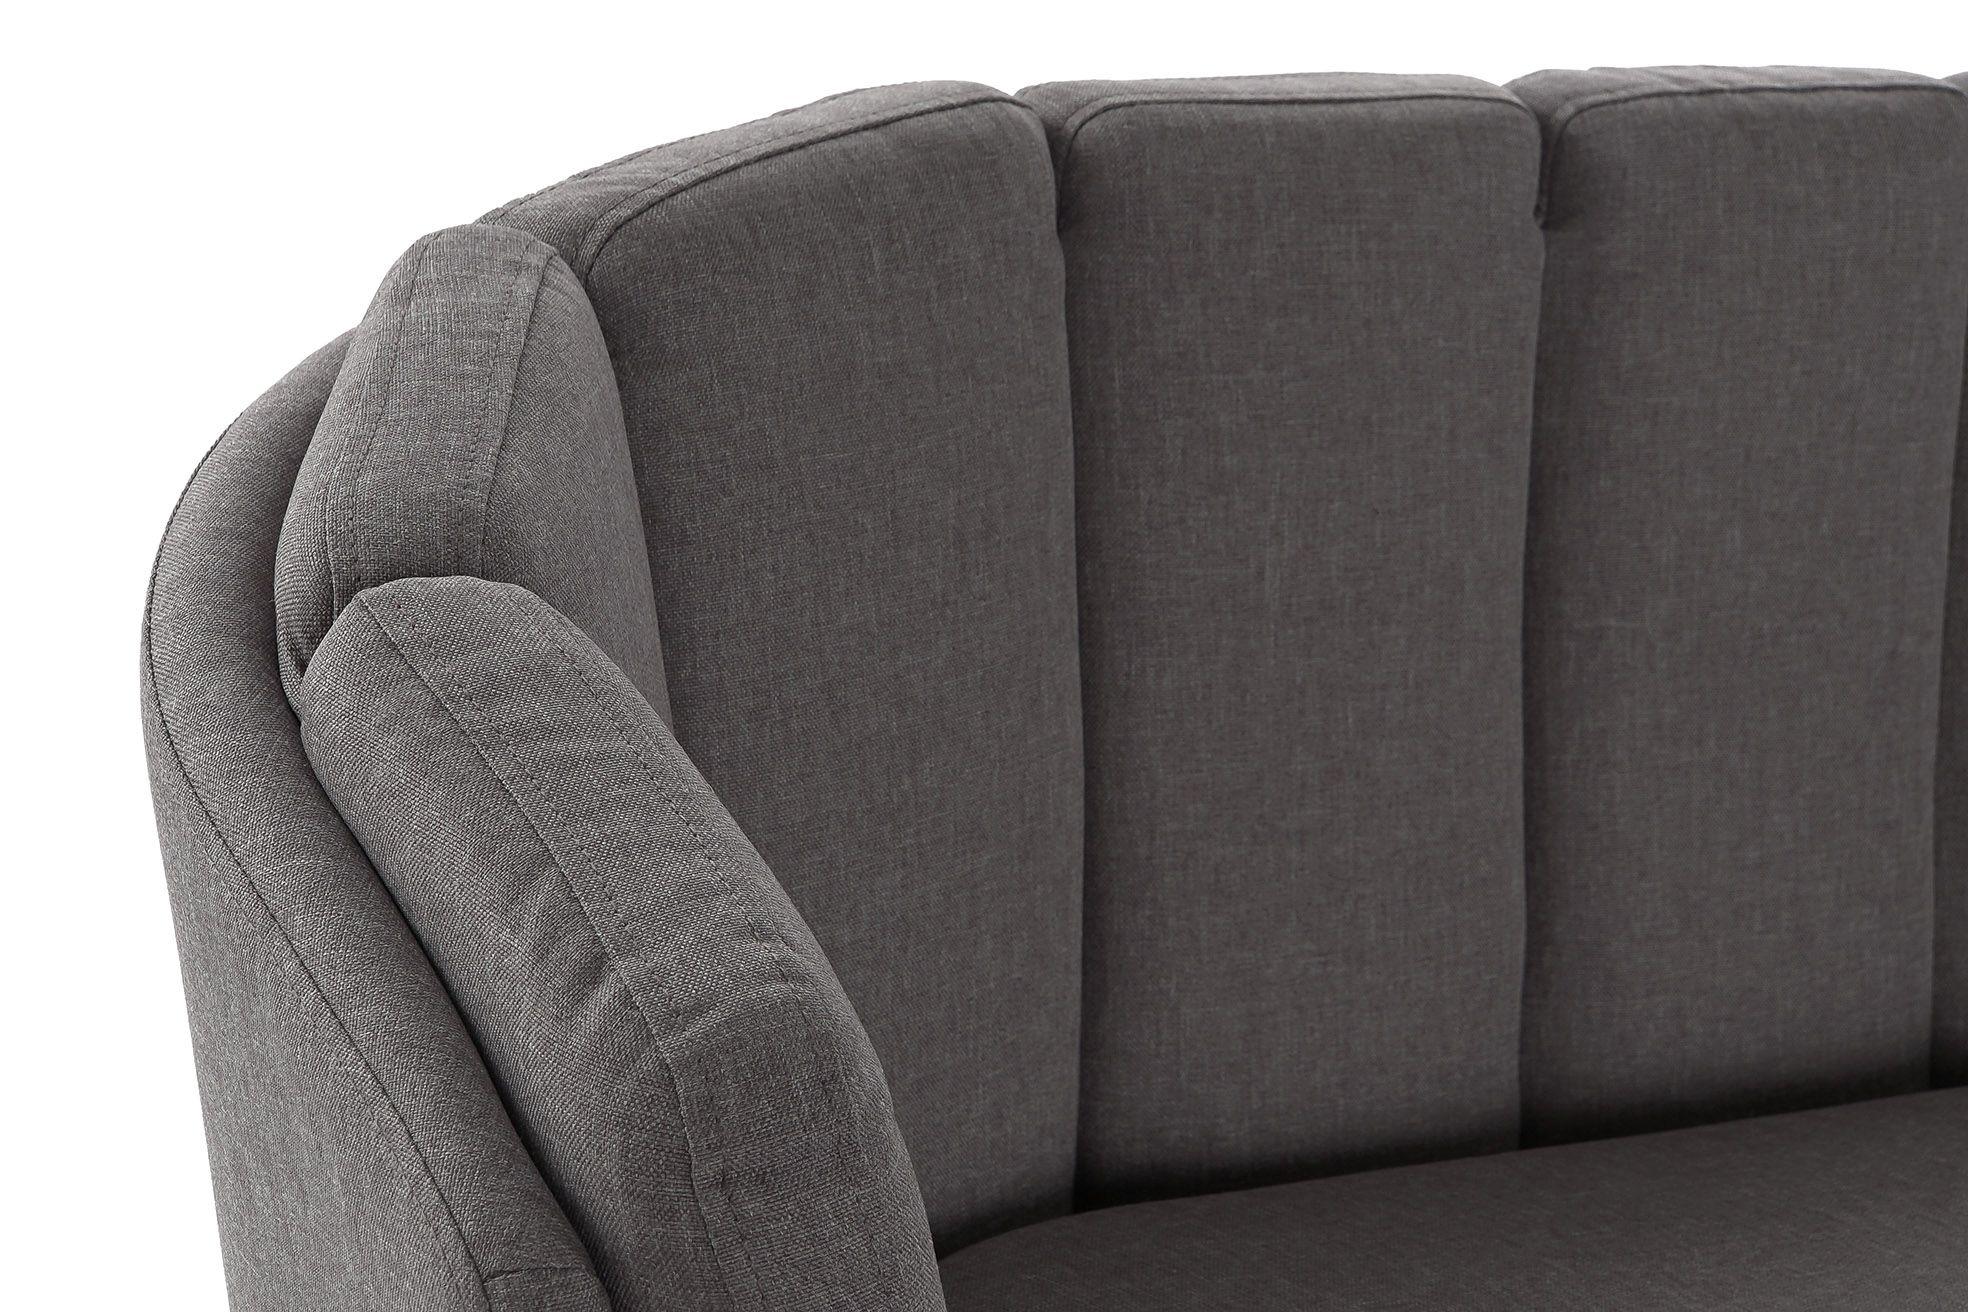 31810-sofa-scandi-deco-2p-5.jpg